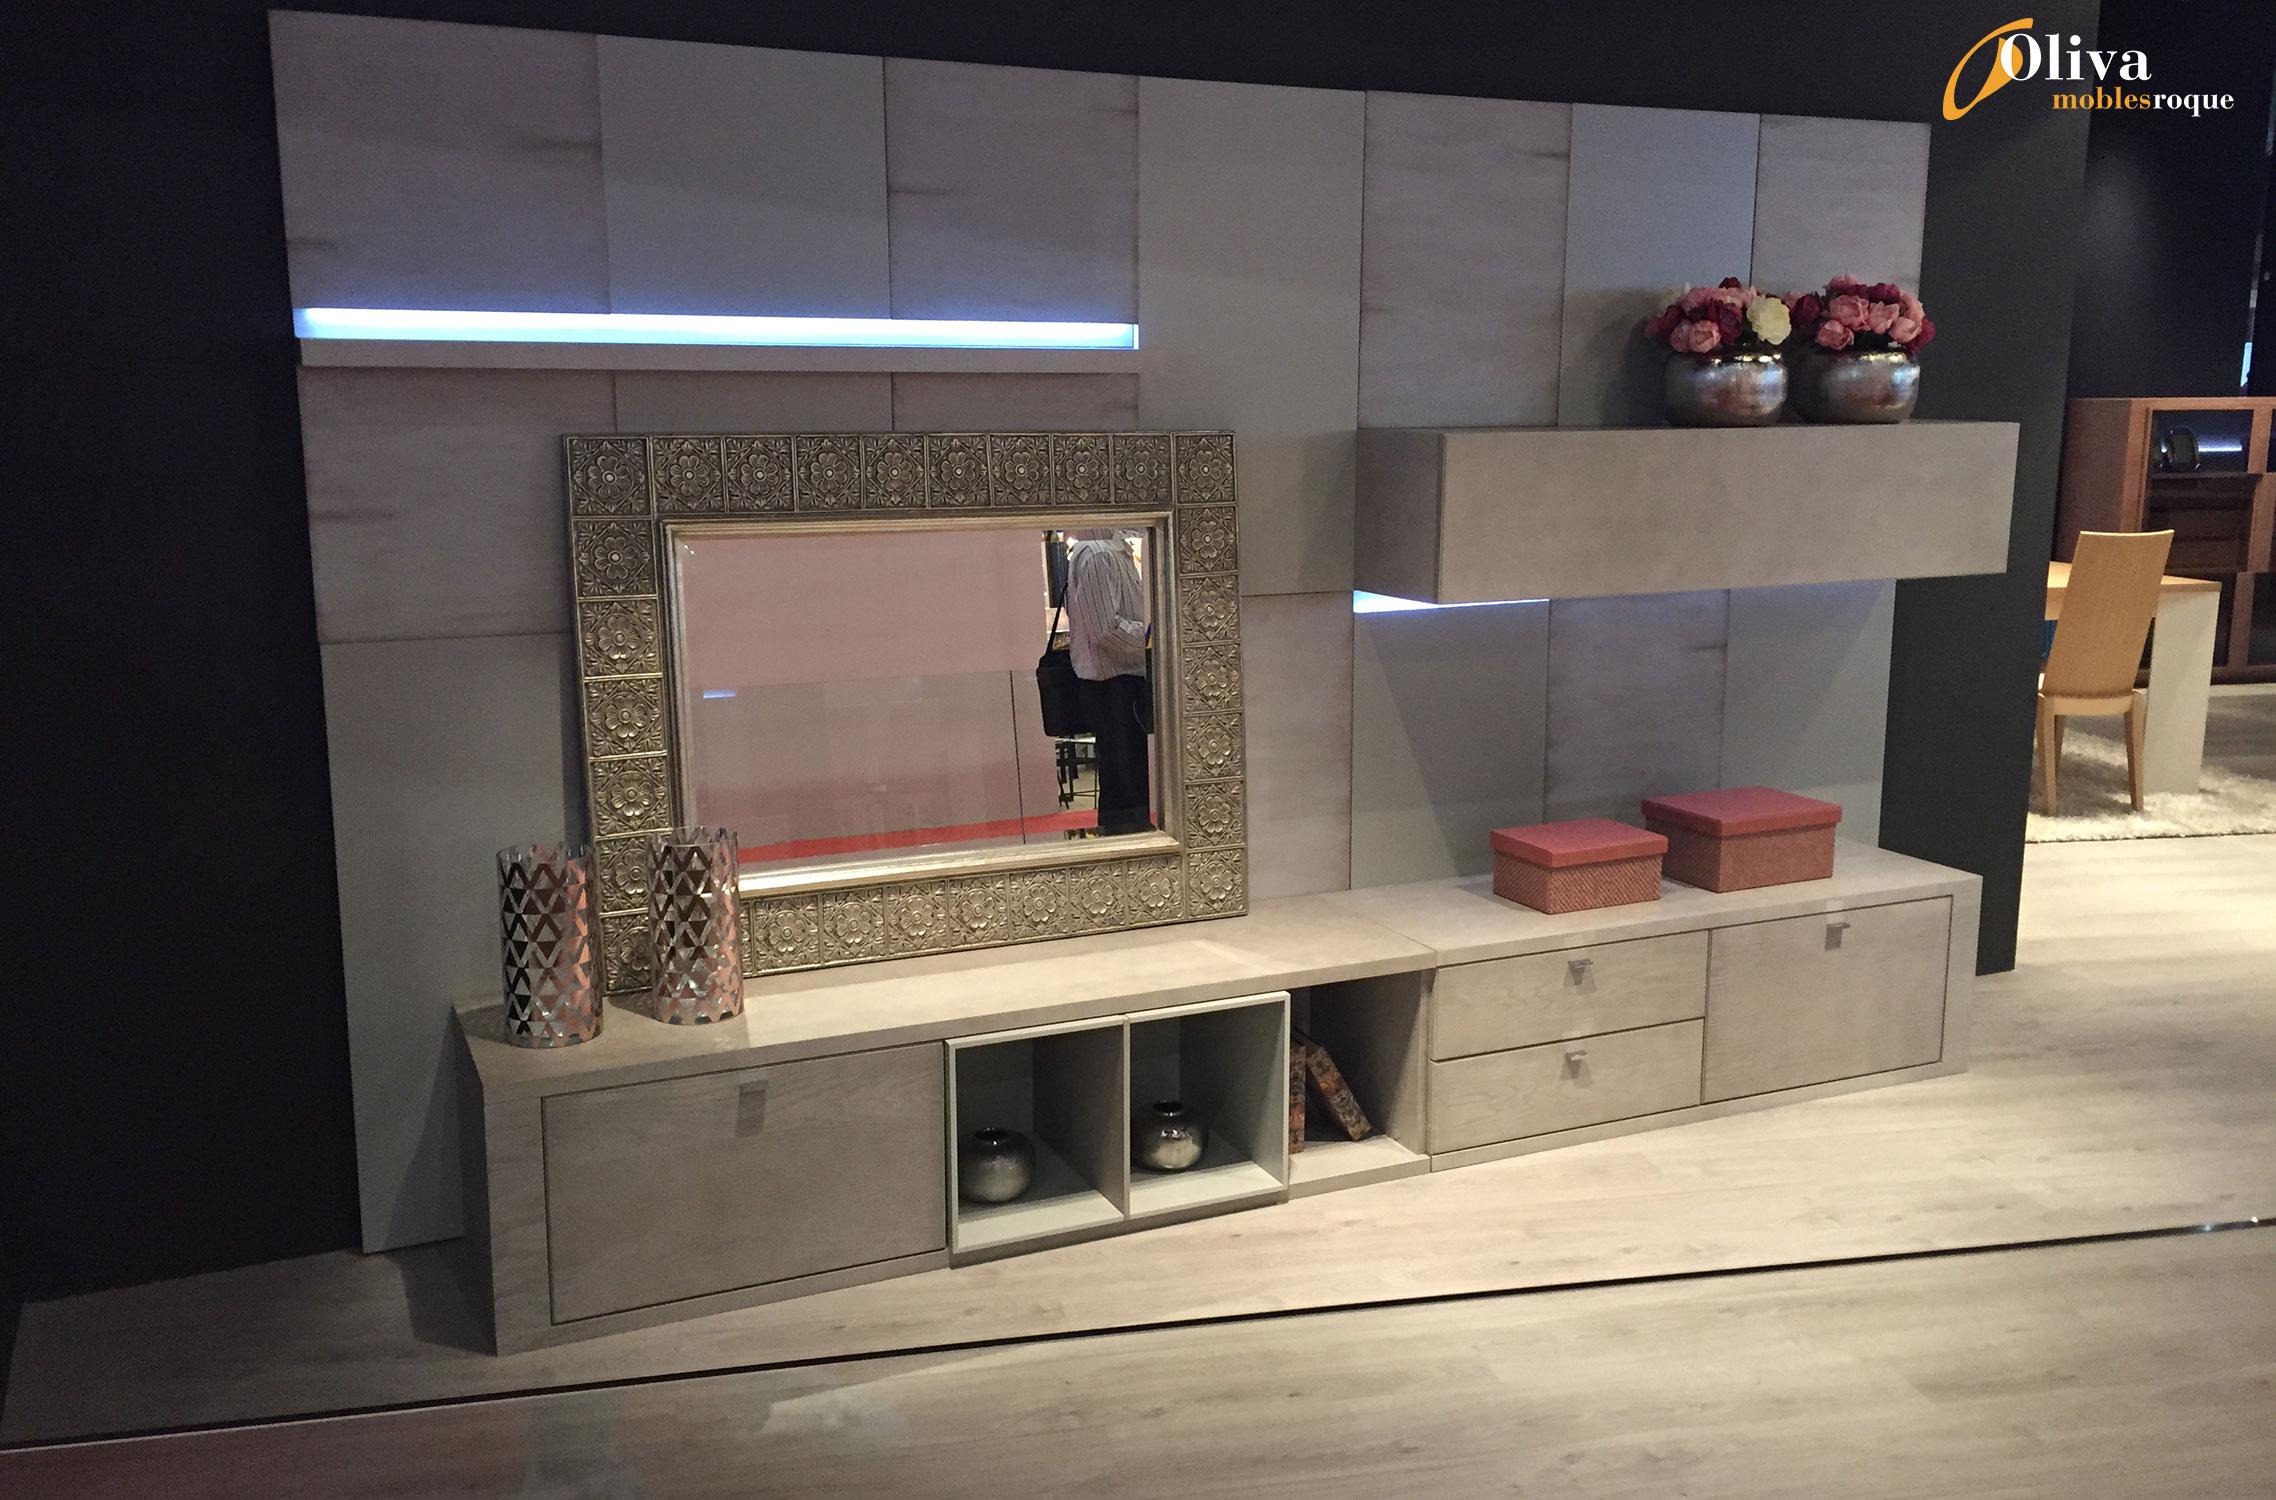 Showroom del mueble barcelona 2015 for Muebles bcn